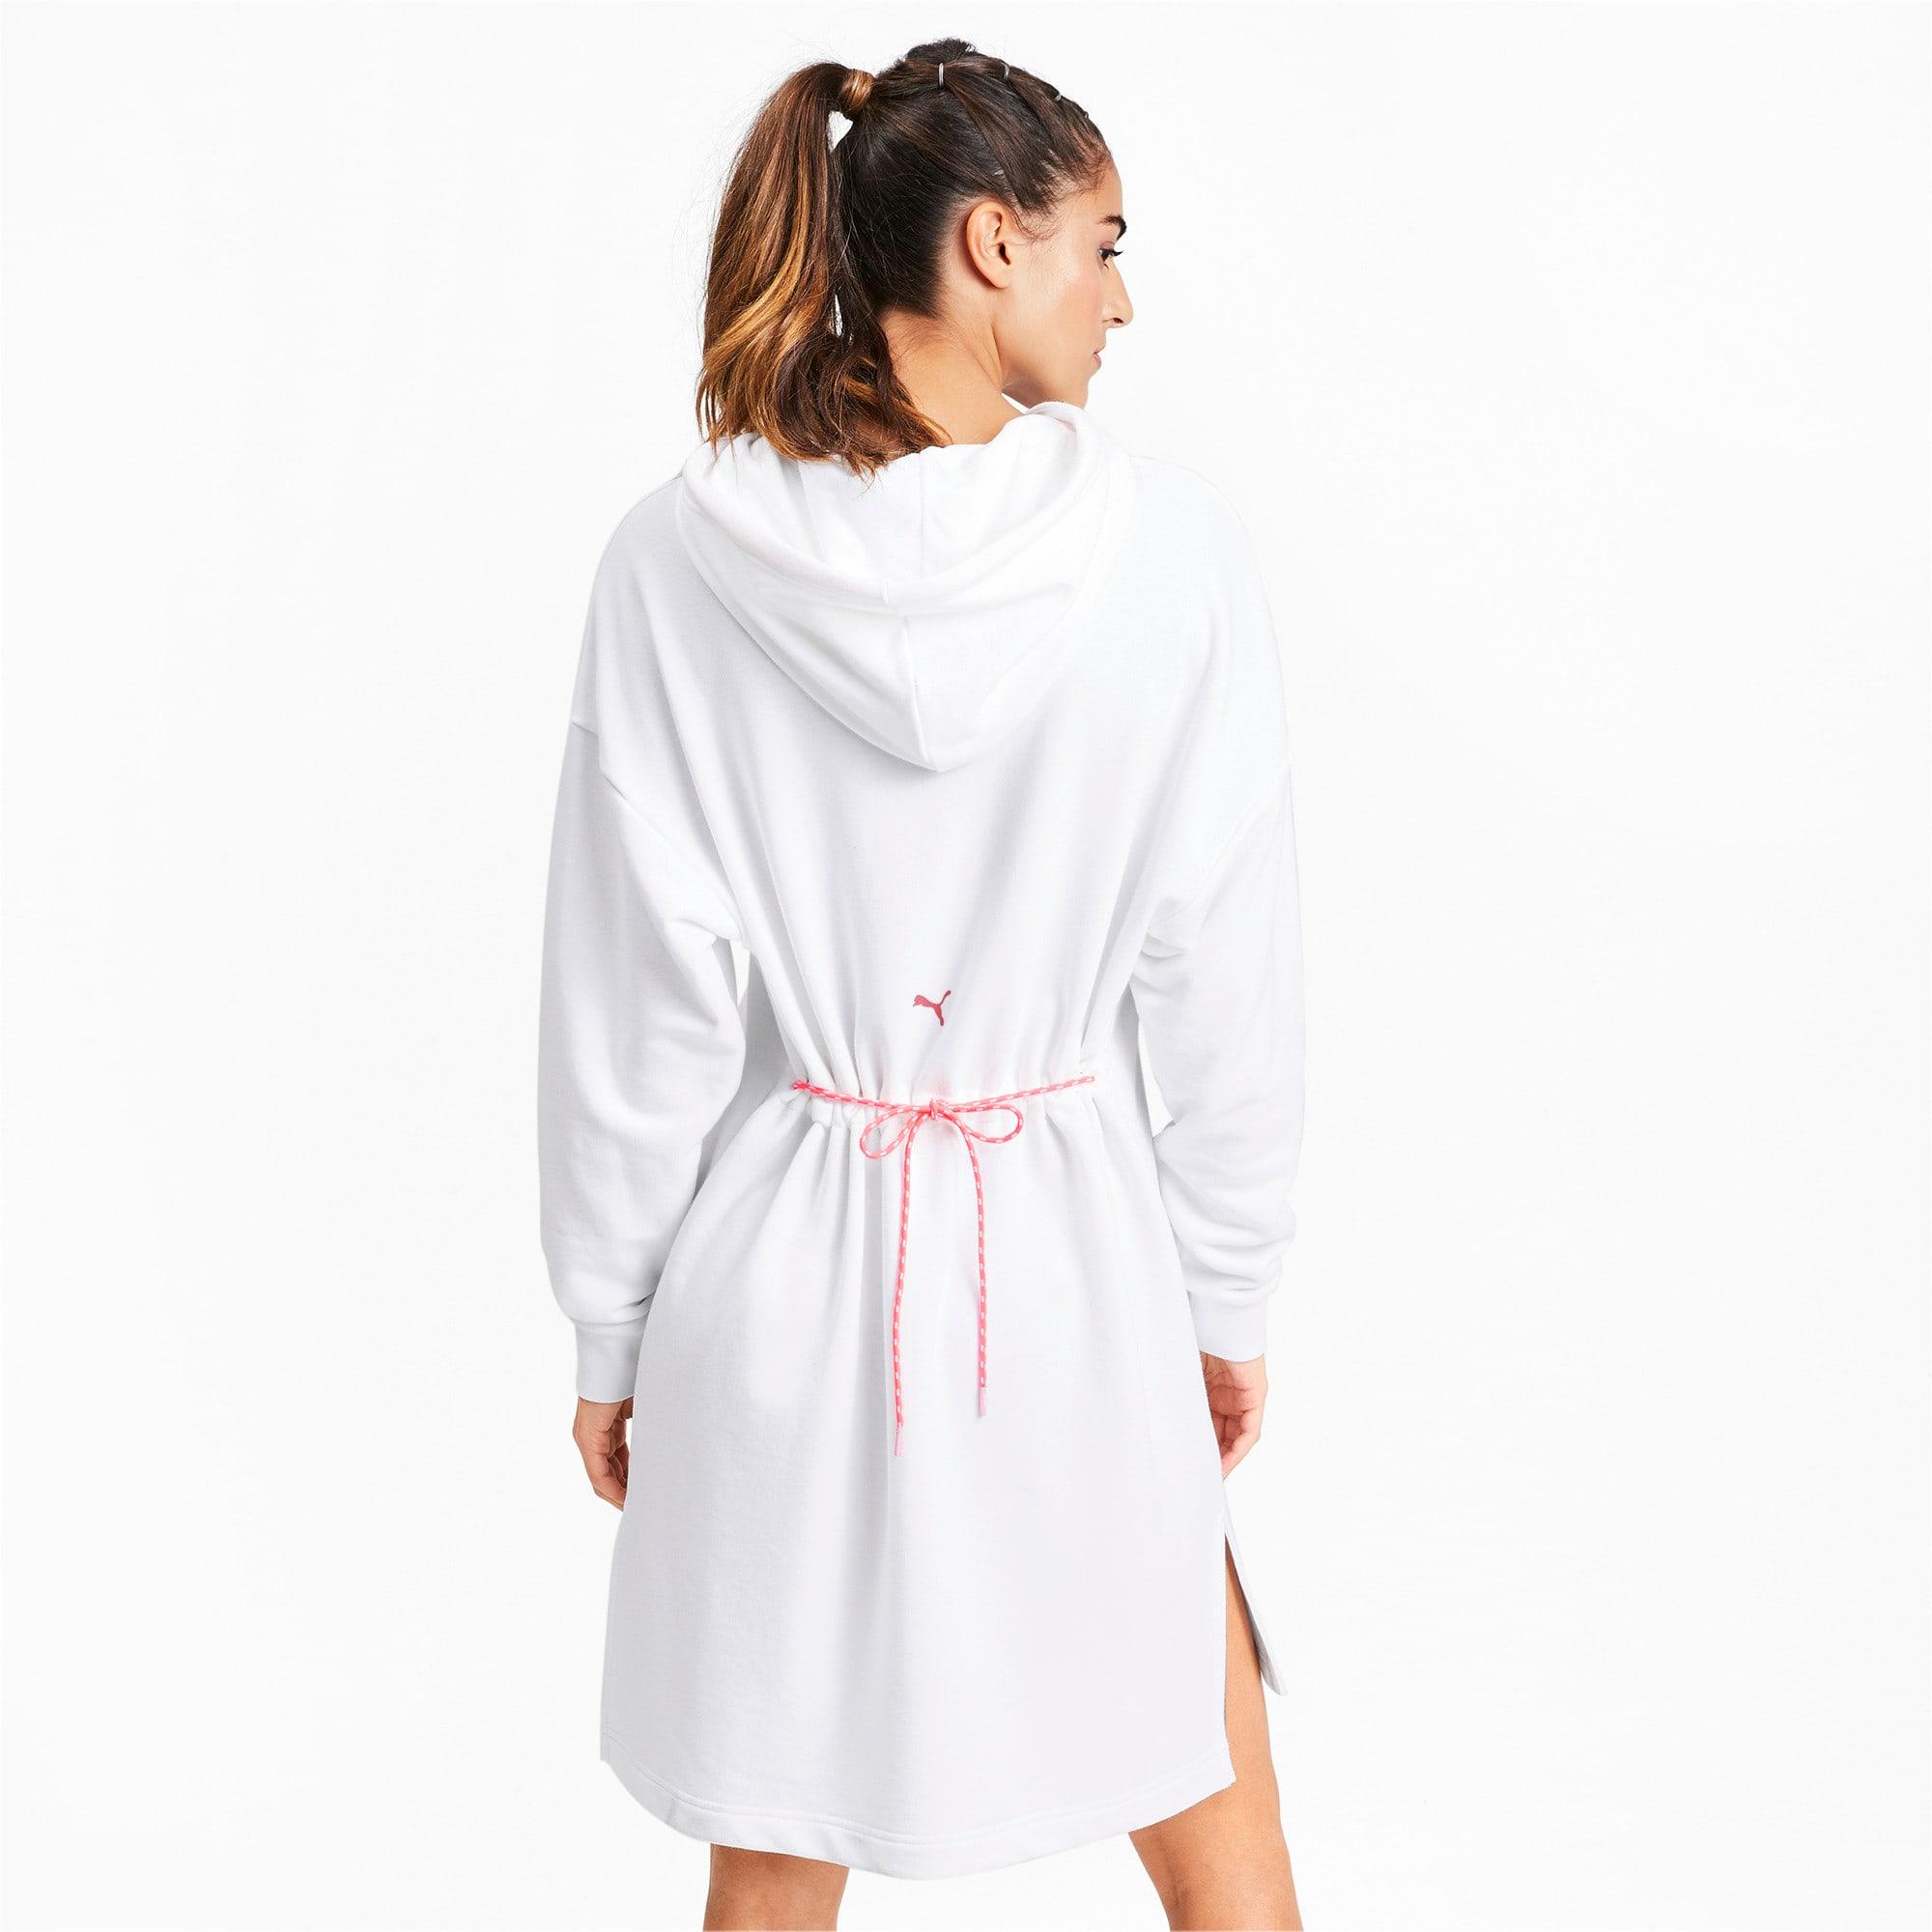 Thumbnail 3 of CHASE ウィメンズ フーデッドドレス, Puma White, medium-JPN